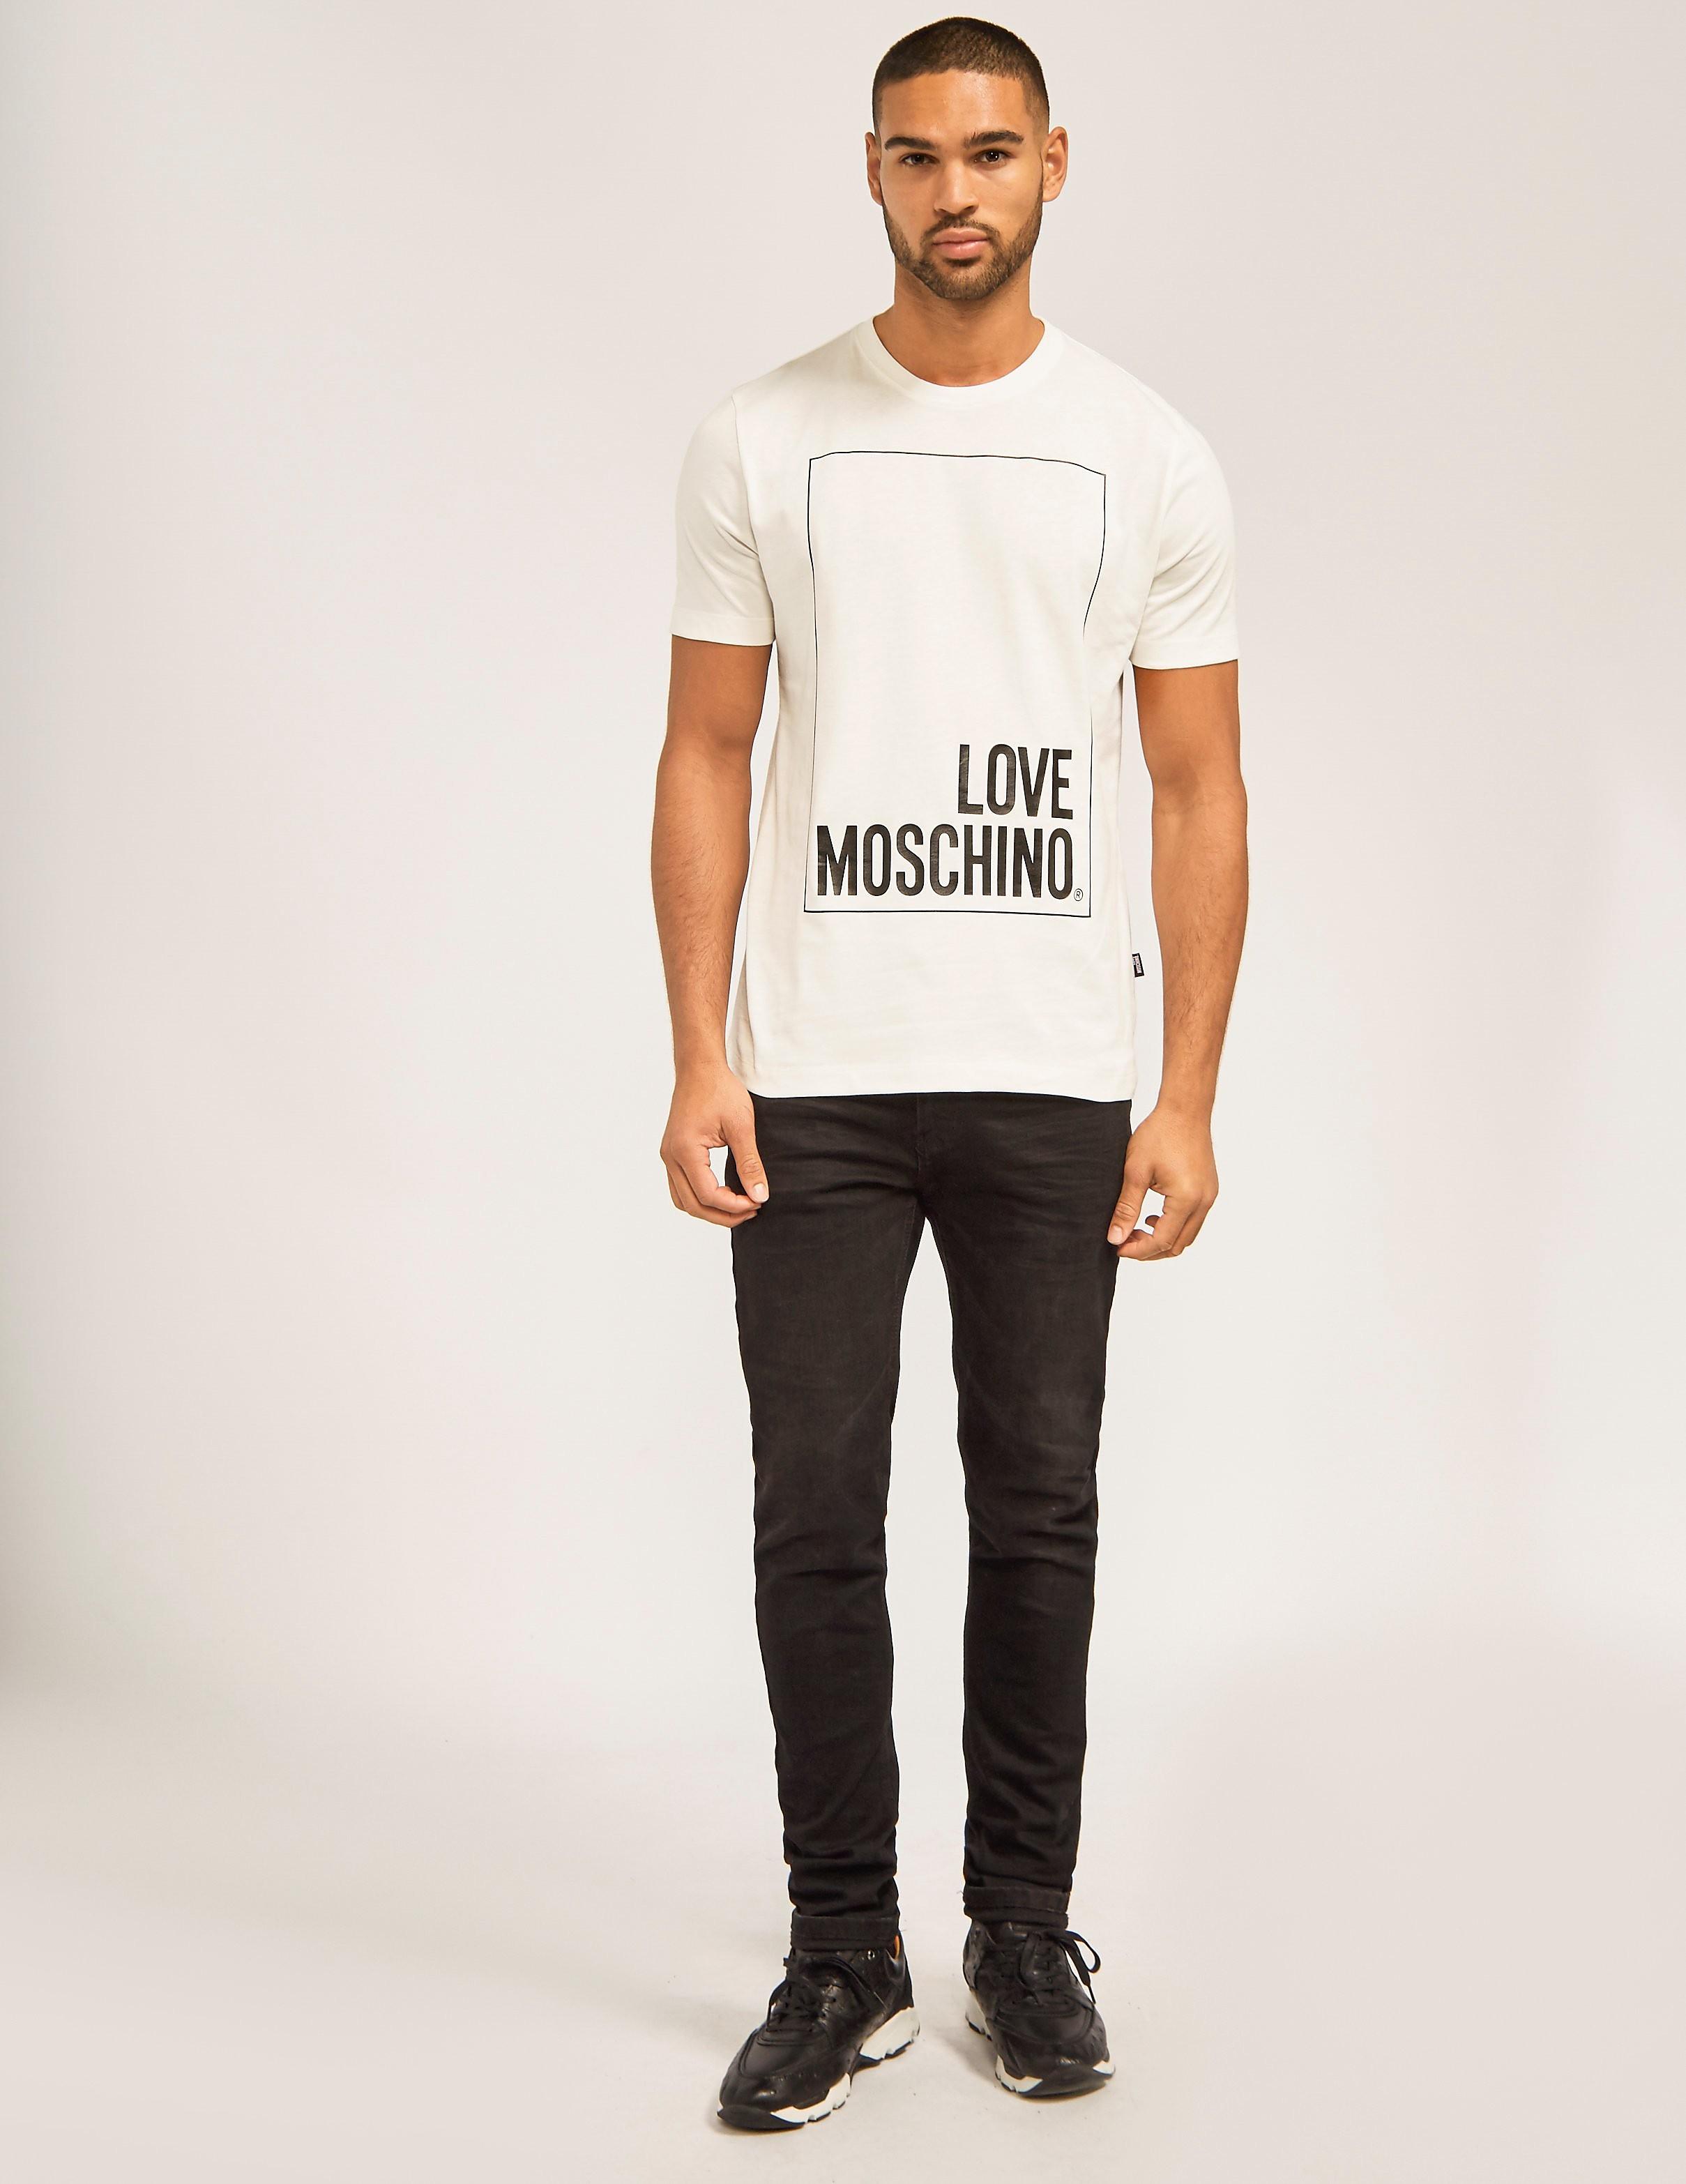 Love Moschino Box LM T-Shirt